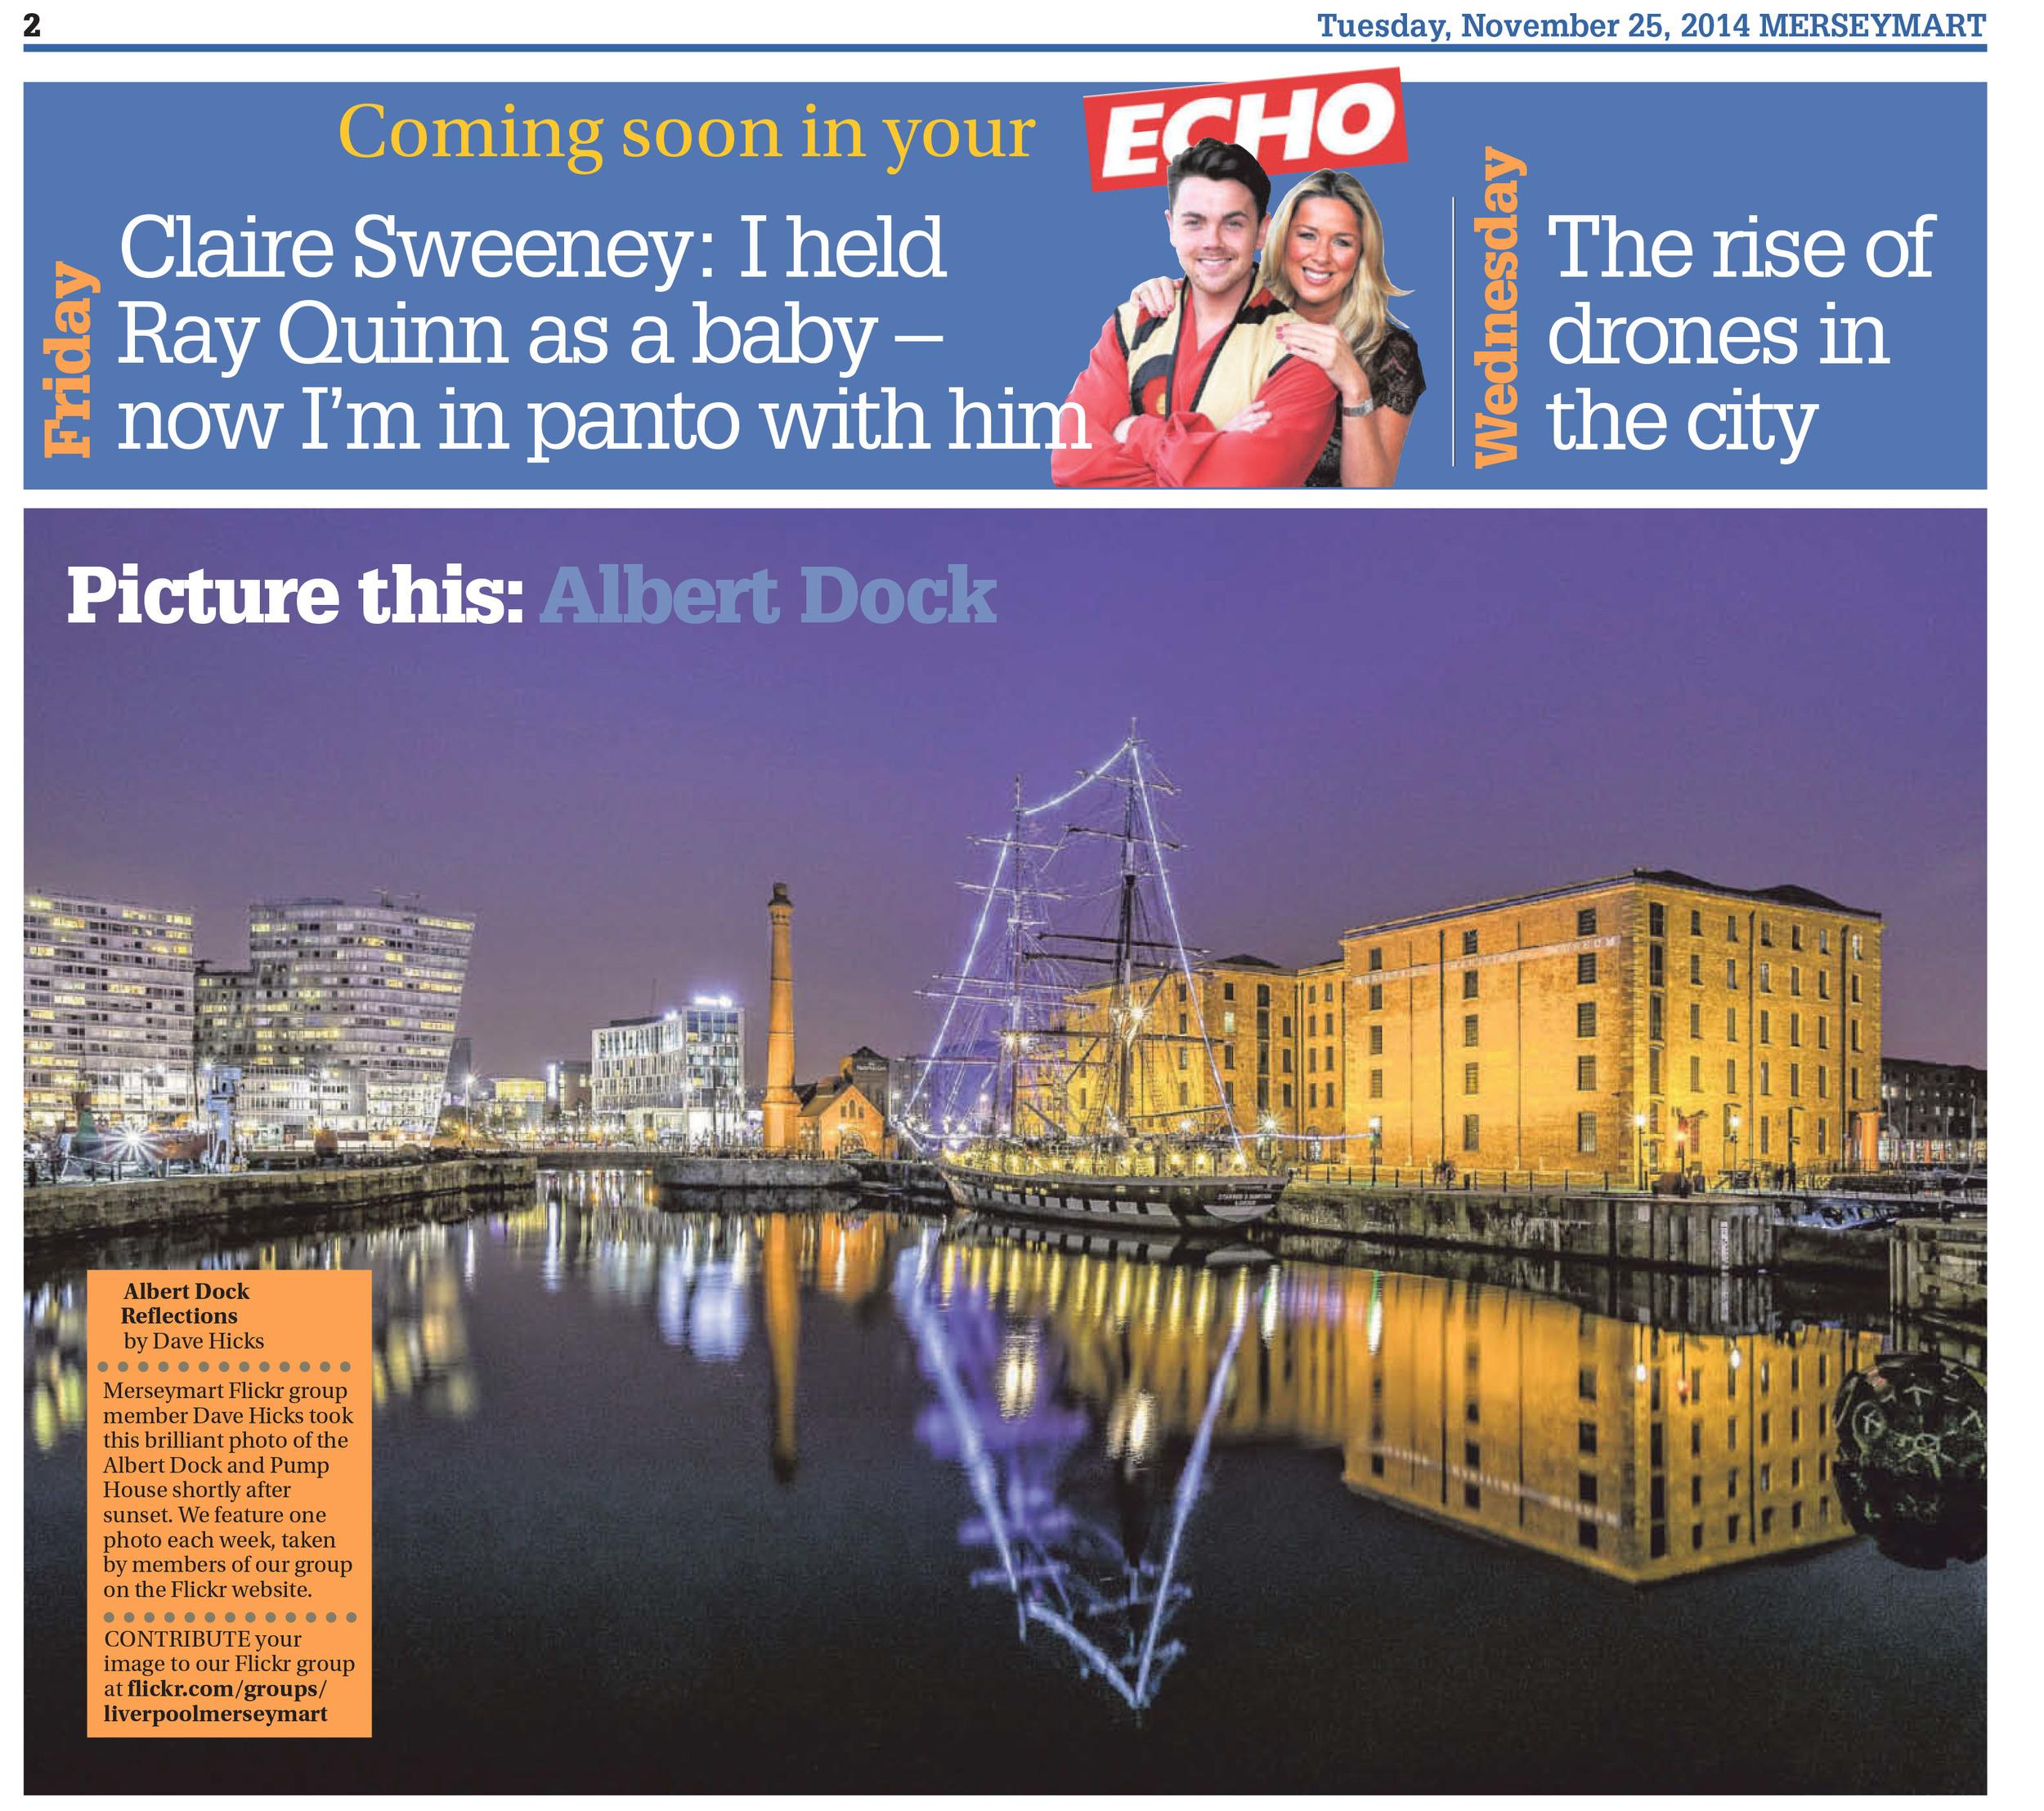 Liverpool Echo Published Photo